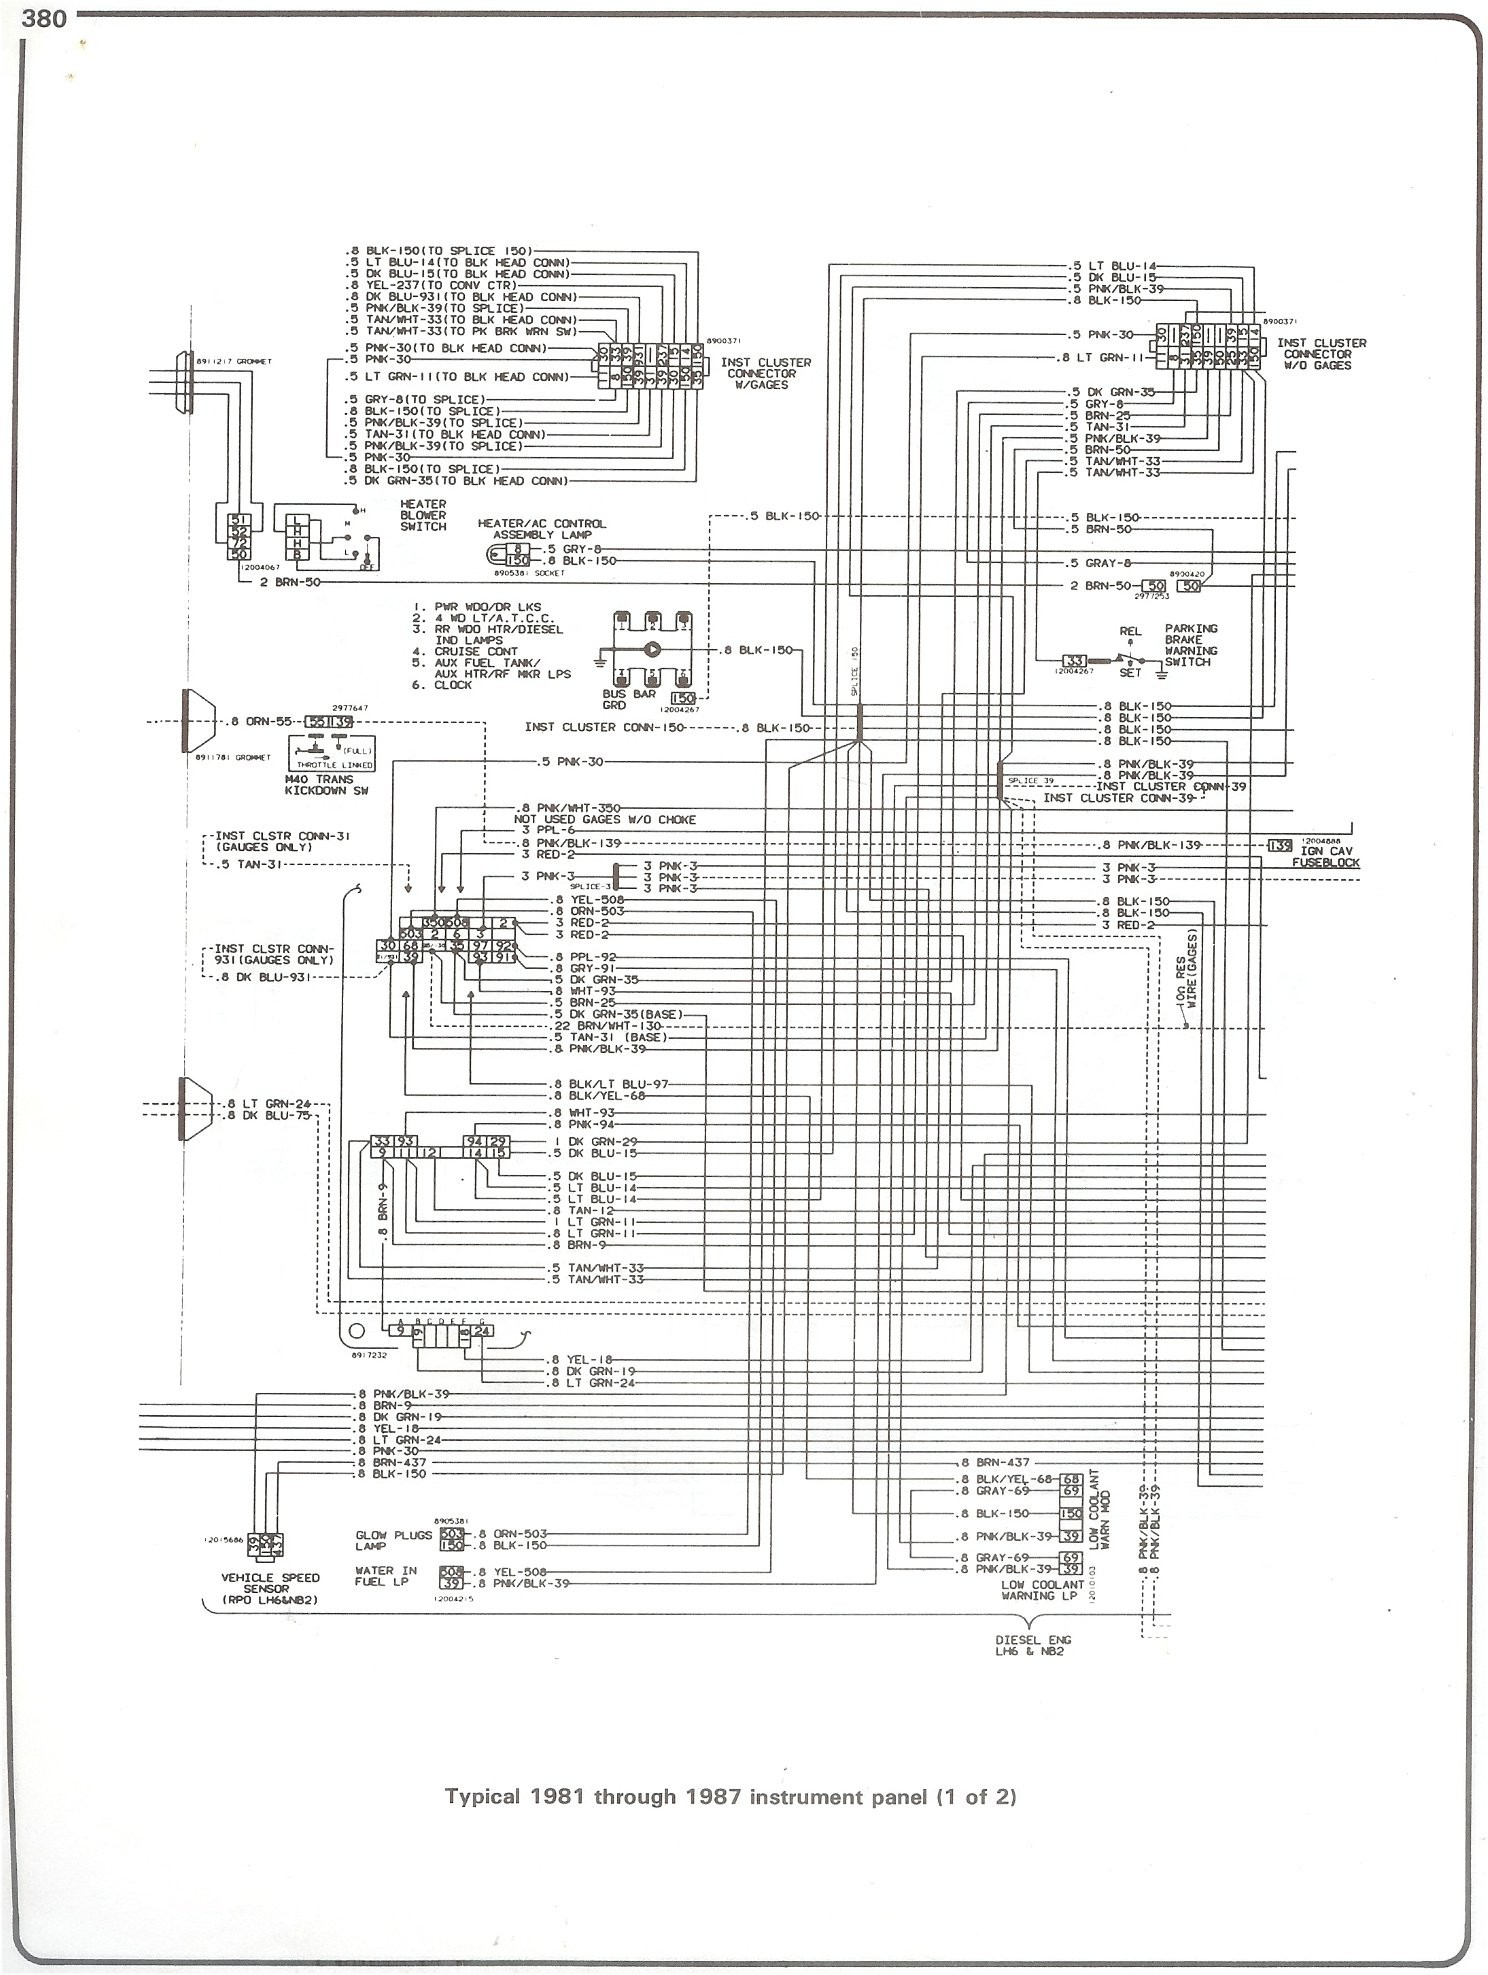 wiring diagram 1985 chevrolet silverado 1500 wiring diagram services u2022 rh openairpublishing com